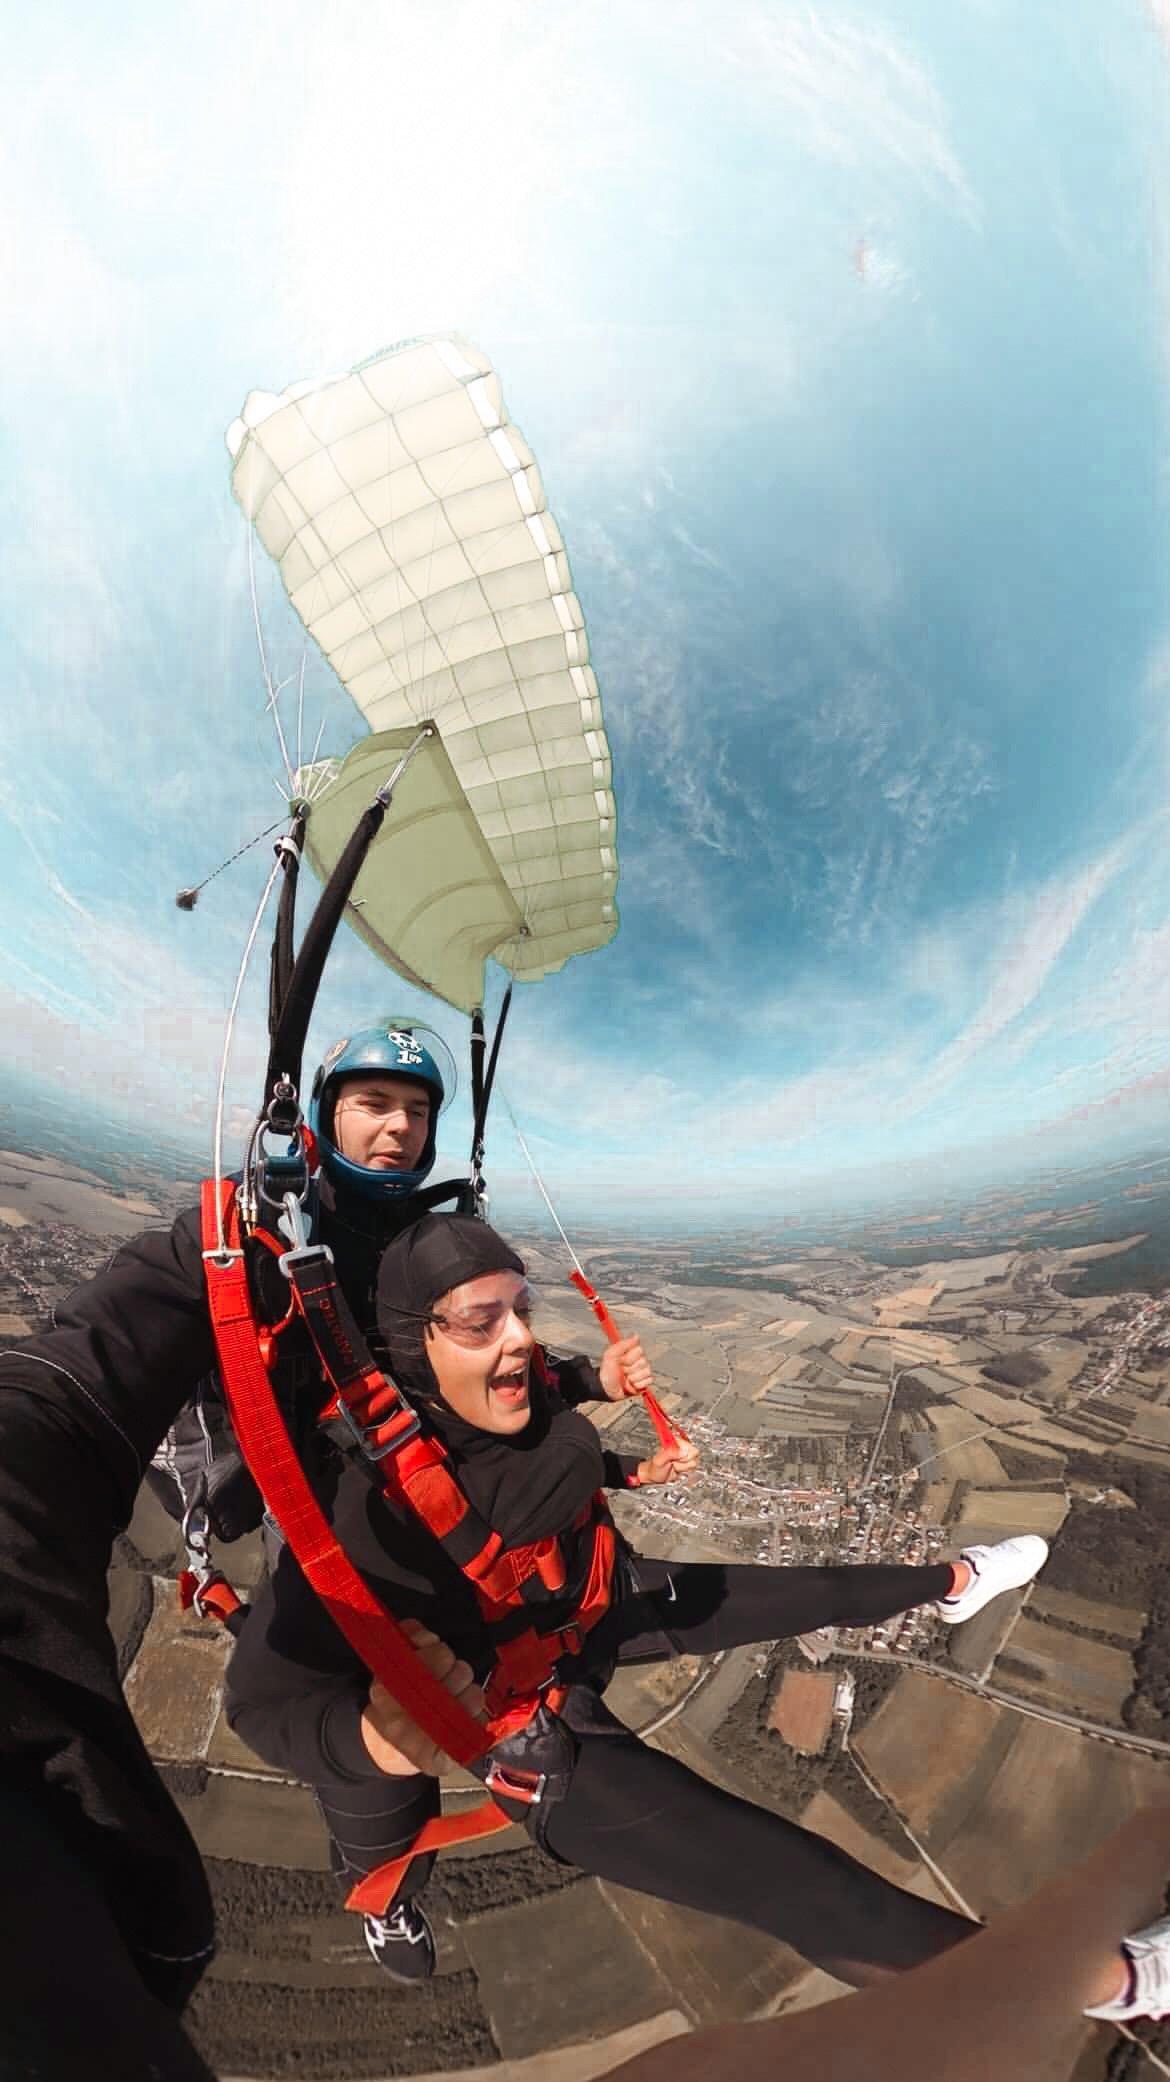 paretec parachute jump, wingman mini, paratec emergency parachute, juliet sierra, flyhy